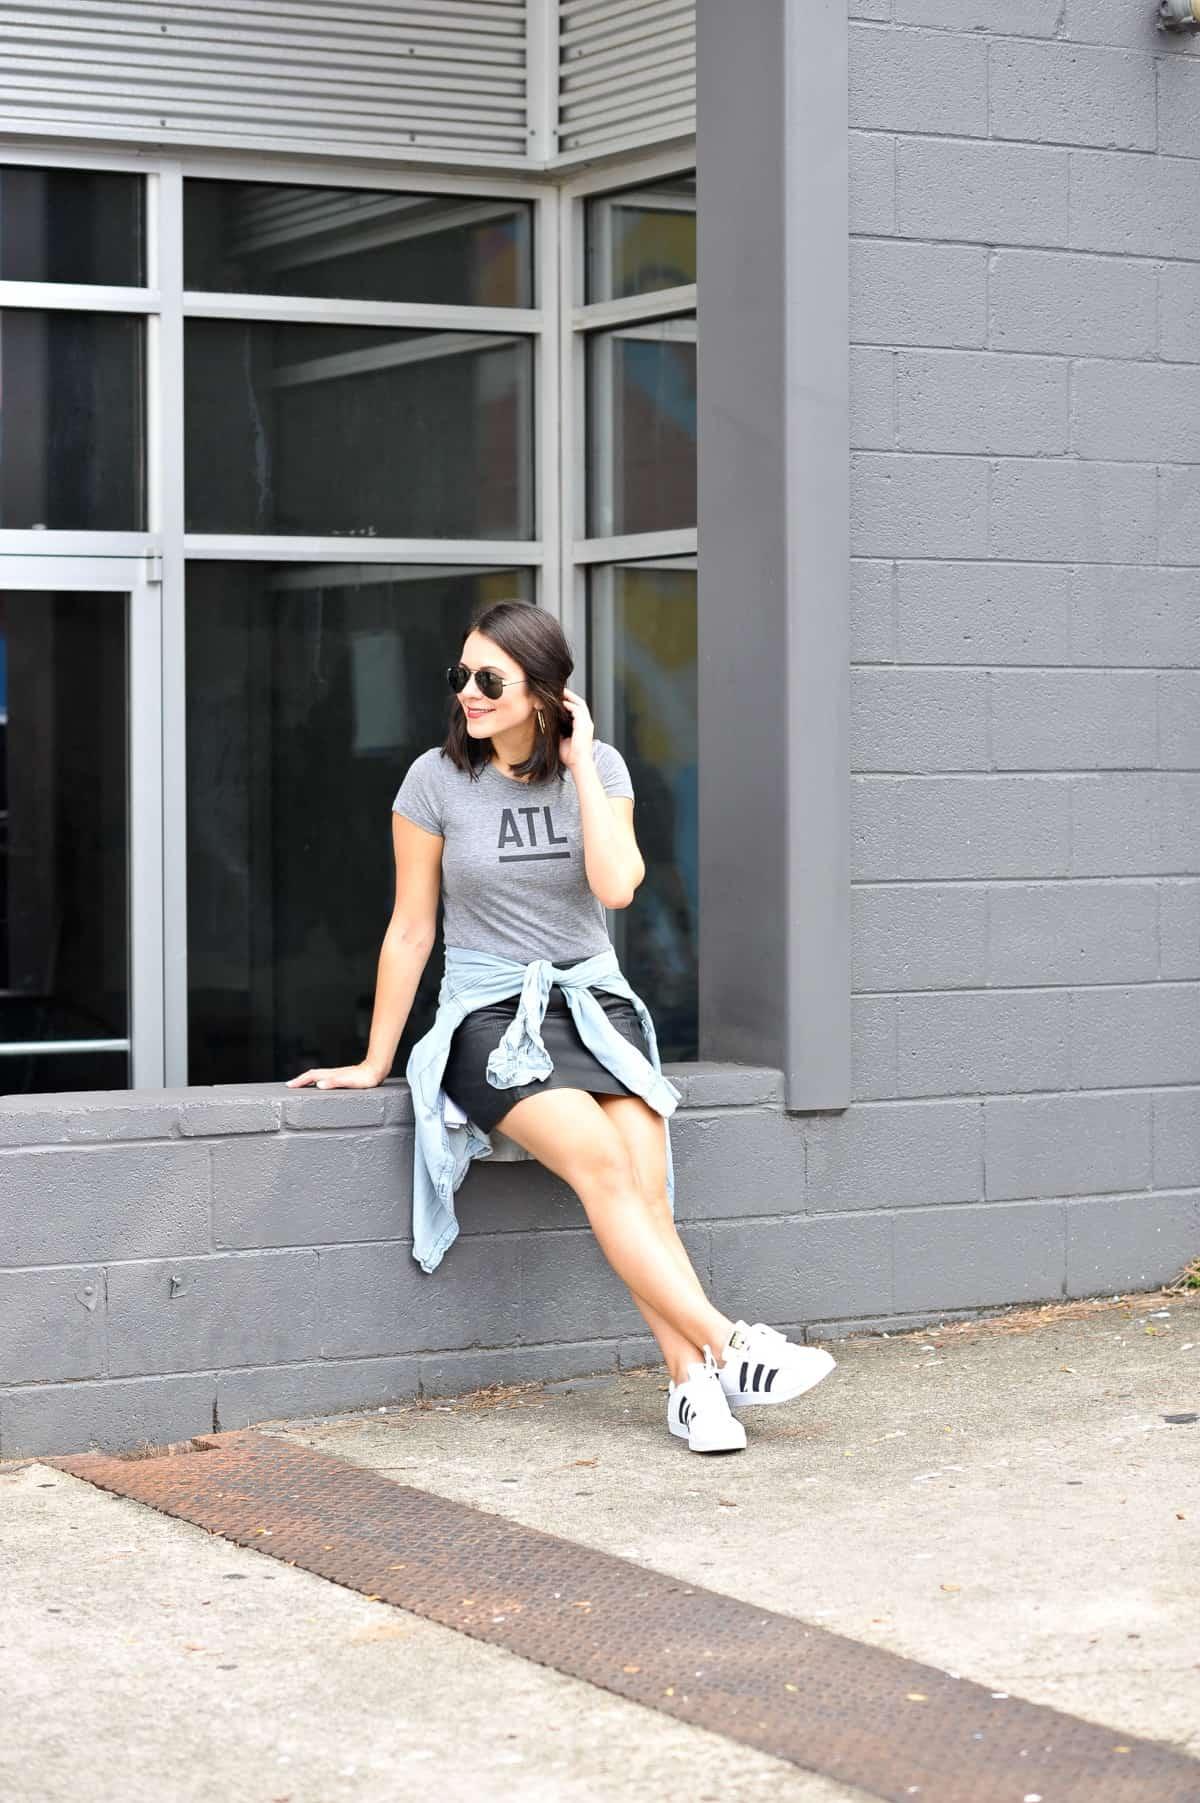 best atlanta based clothing brands, affordable outfit ideas, Adidas Superstars - My Style Vita - @mystylevita - 11